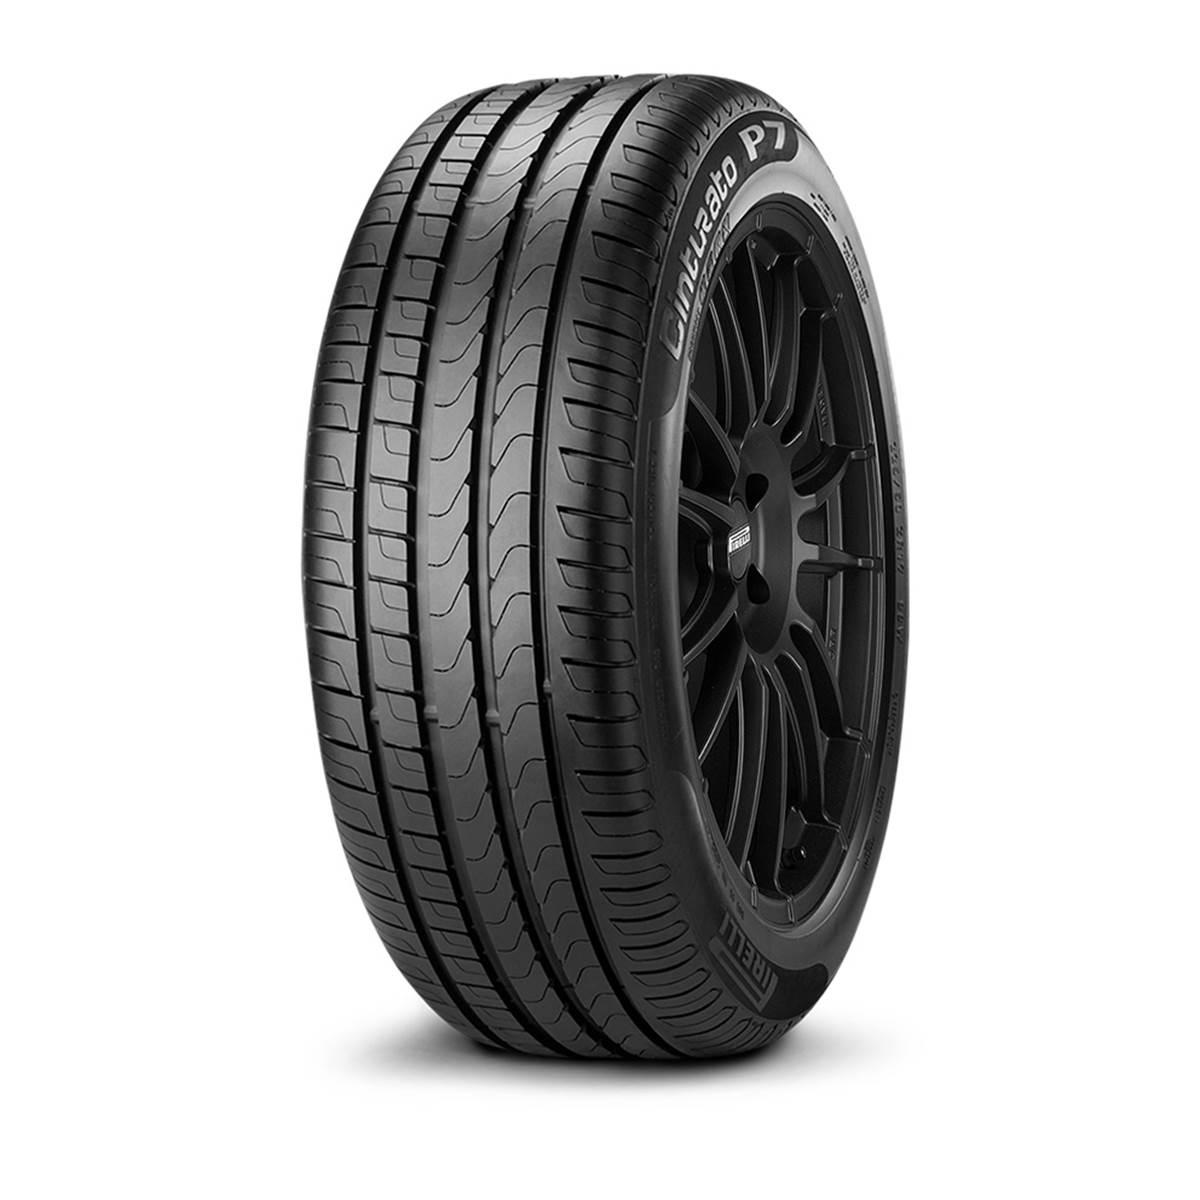 Pneu Pirelli 205/50R17 89V Cinturato P7